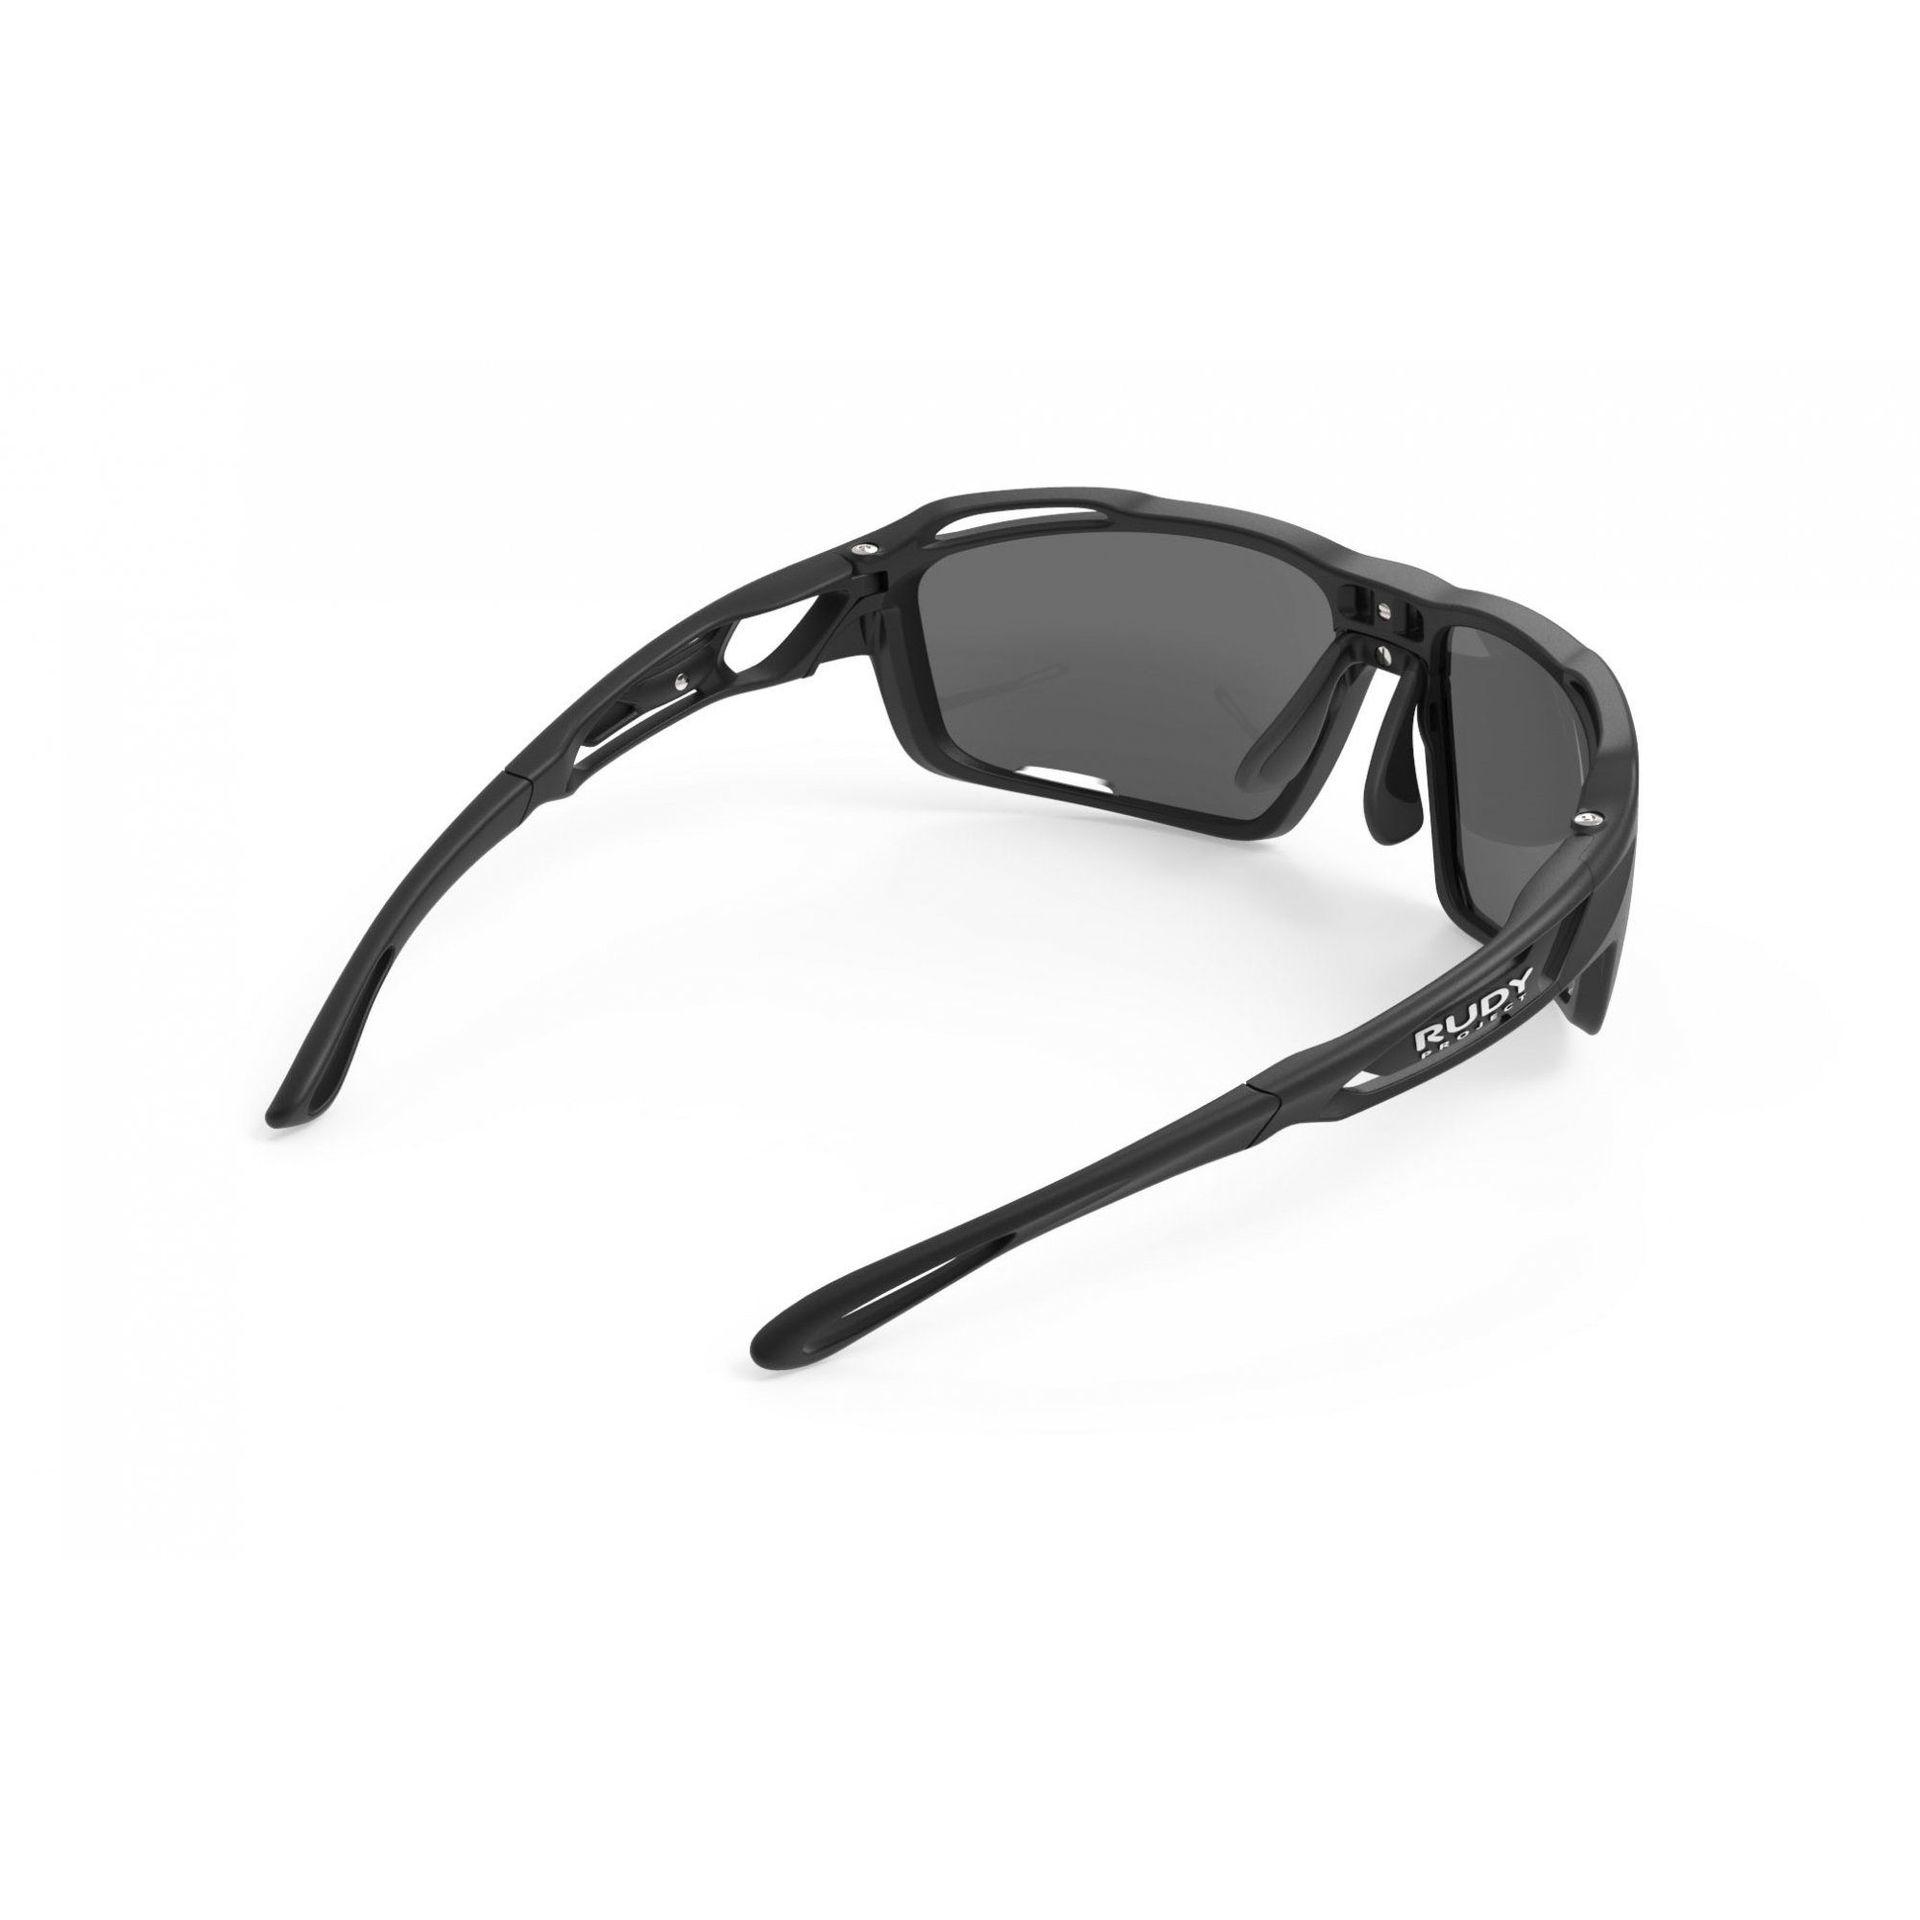 OKULARY RUDY PROJECT SINTRYX BLACK + SMOKE TRANS SP491006 5